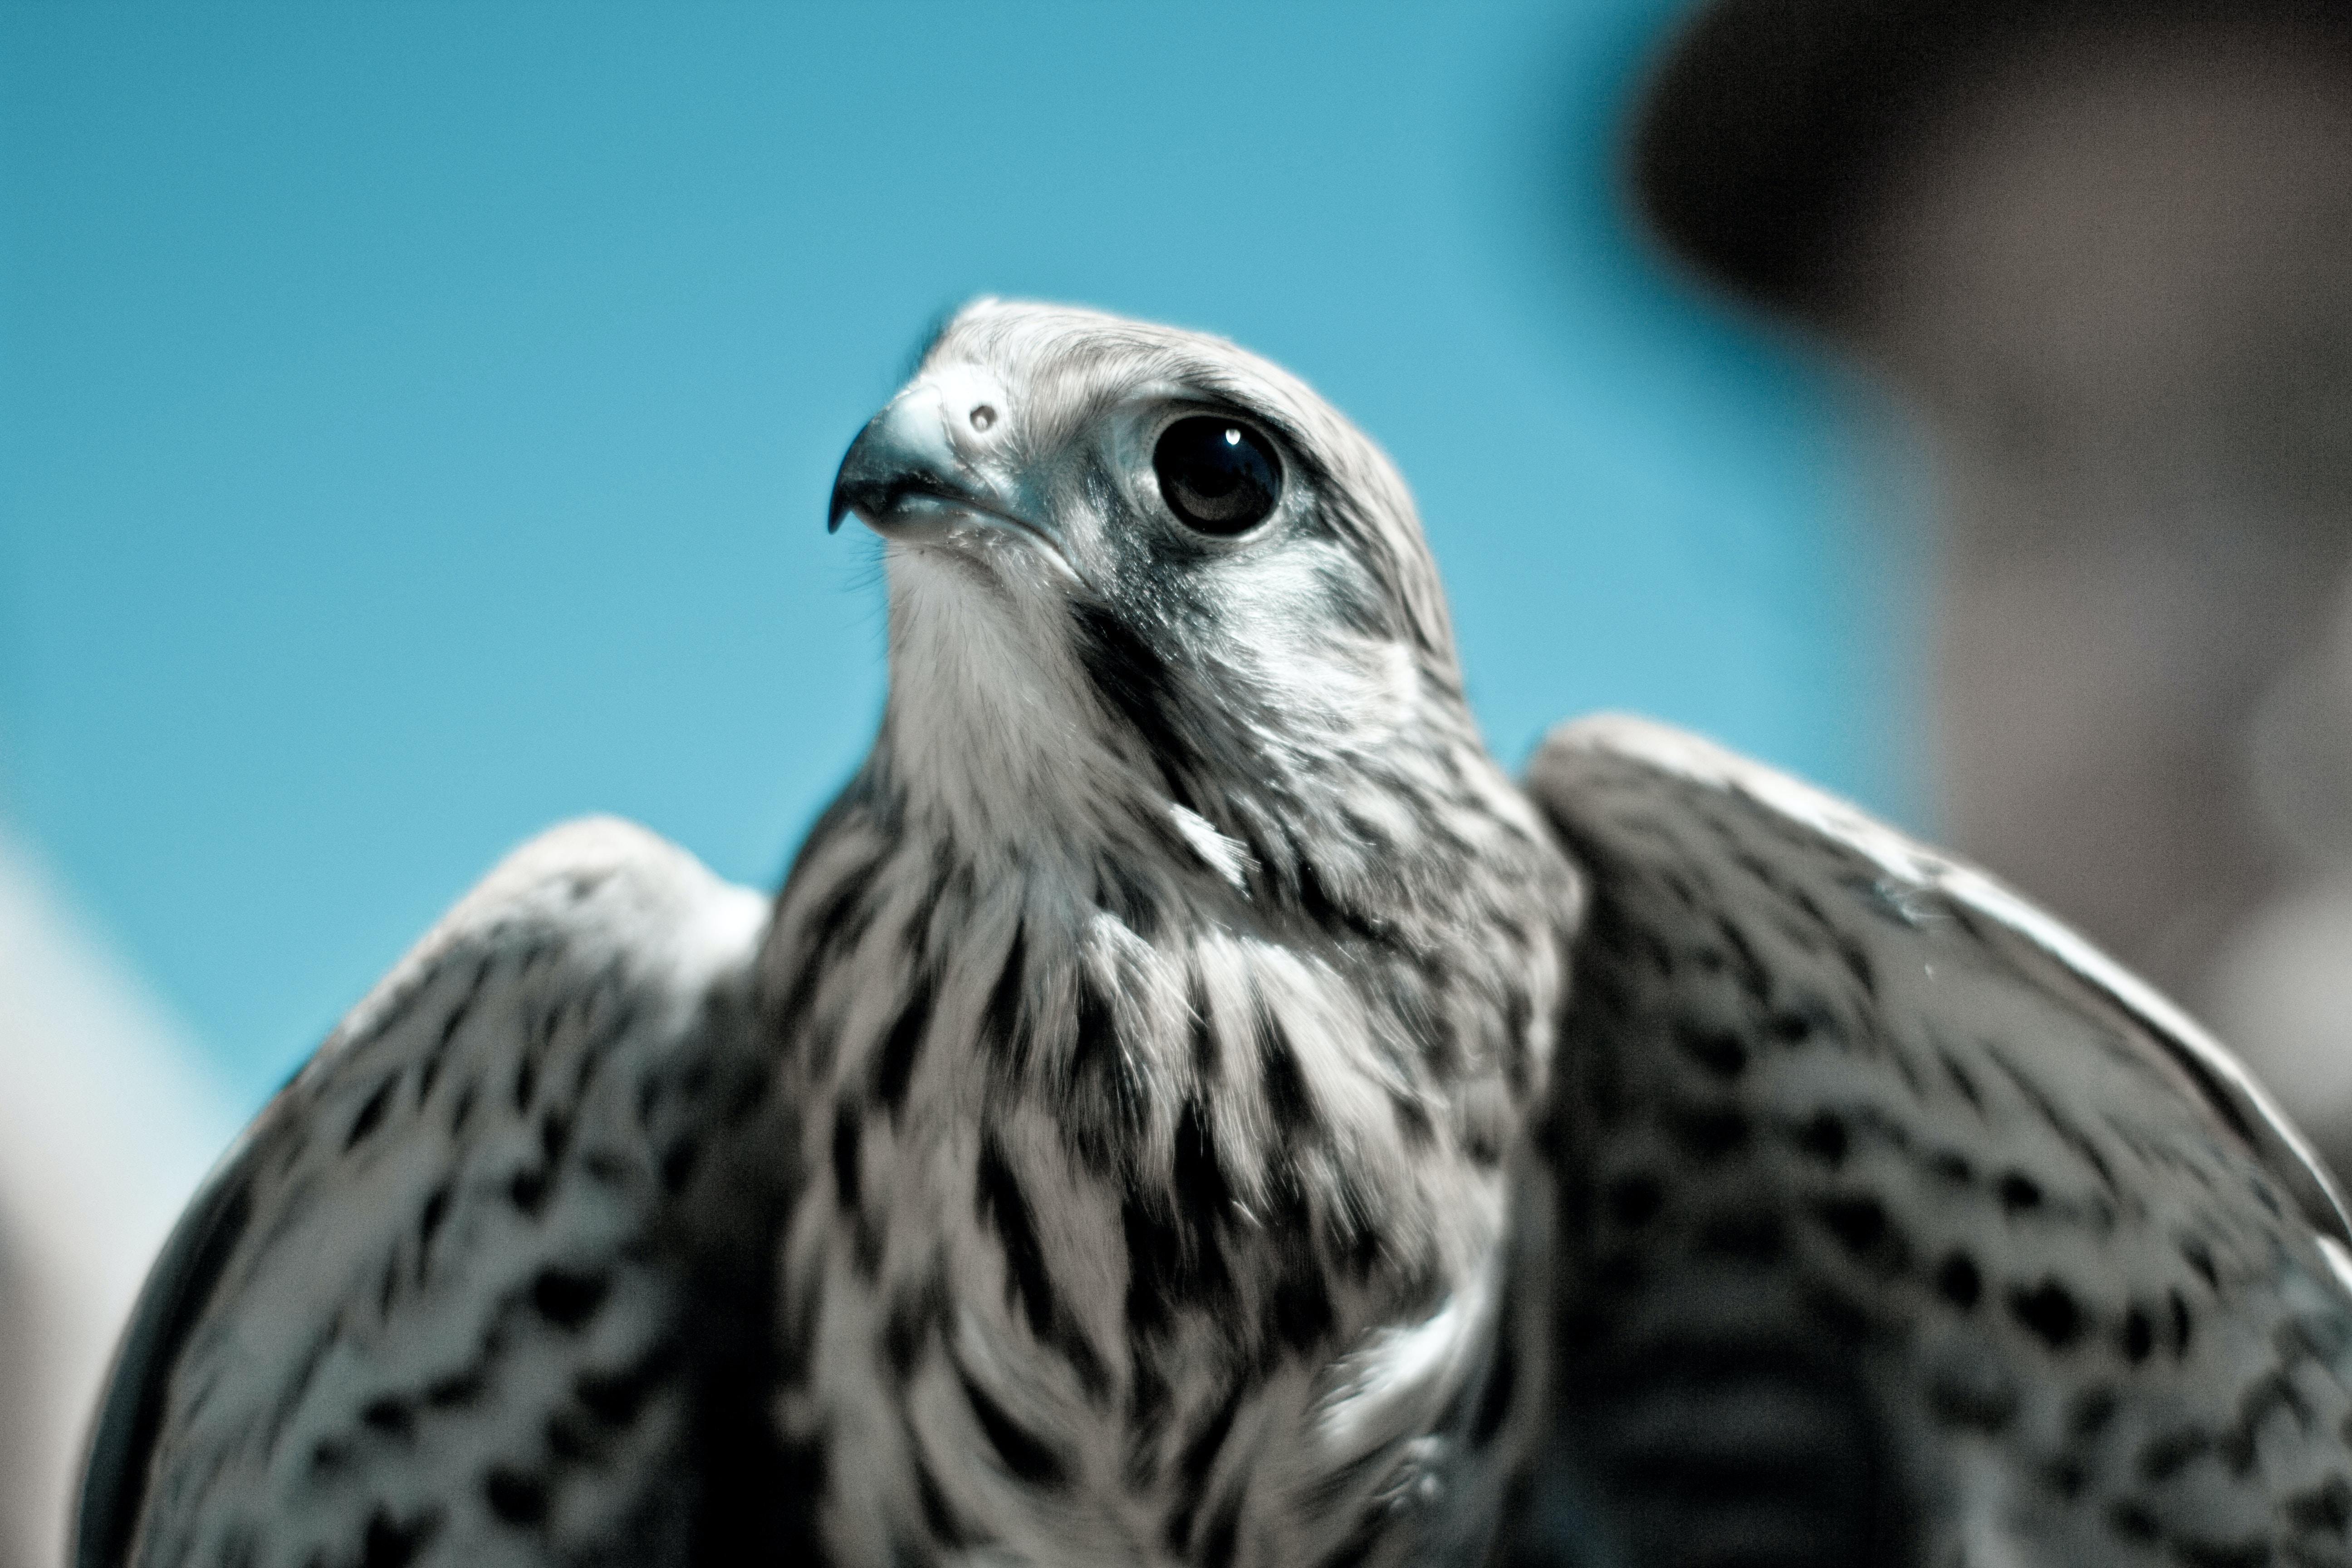 white and black eagle